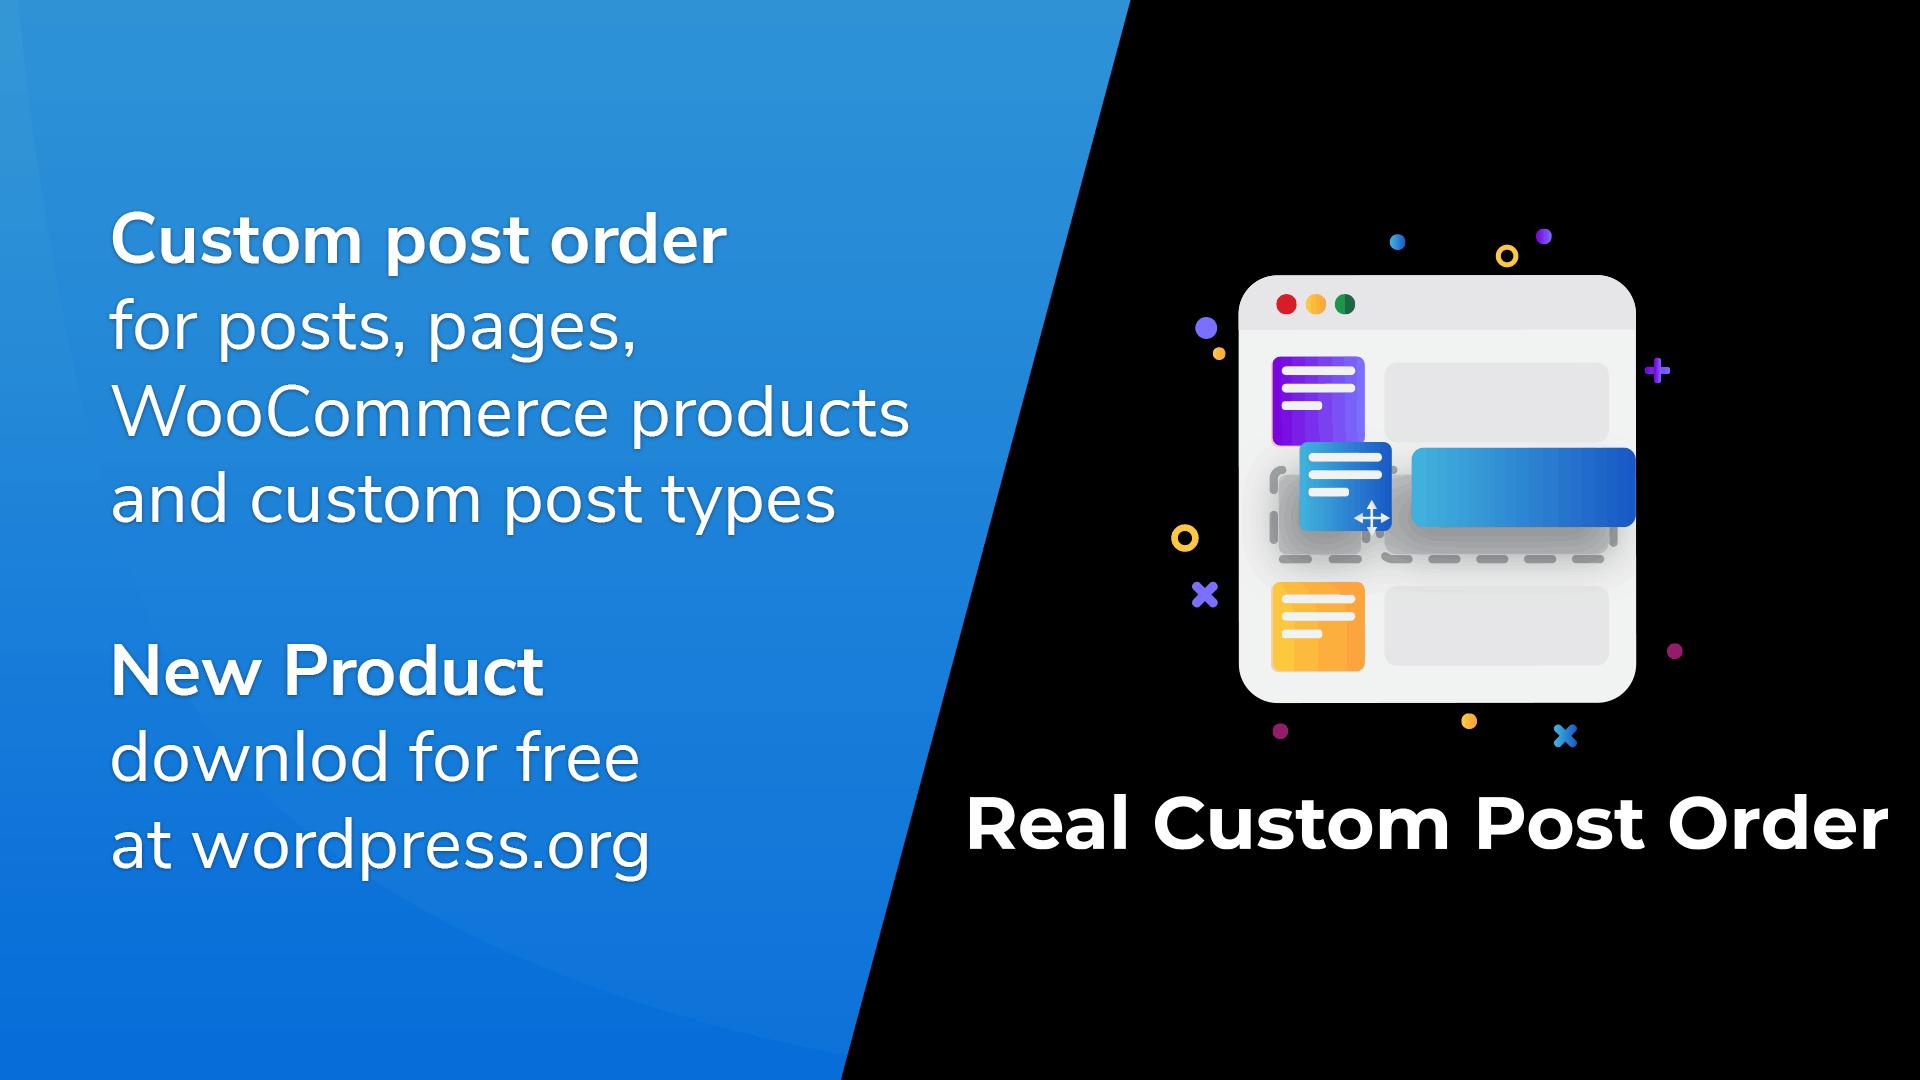 Real Custom Post Order Version 1.0